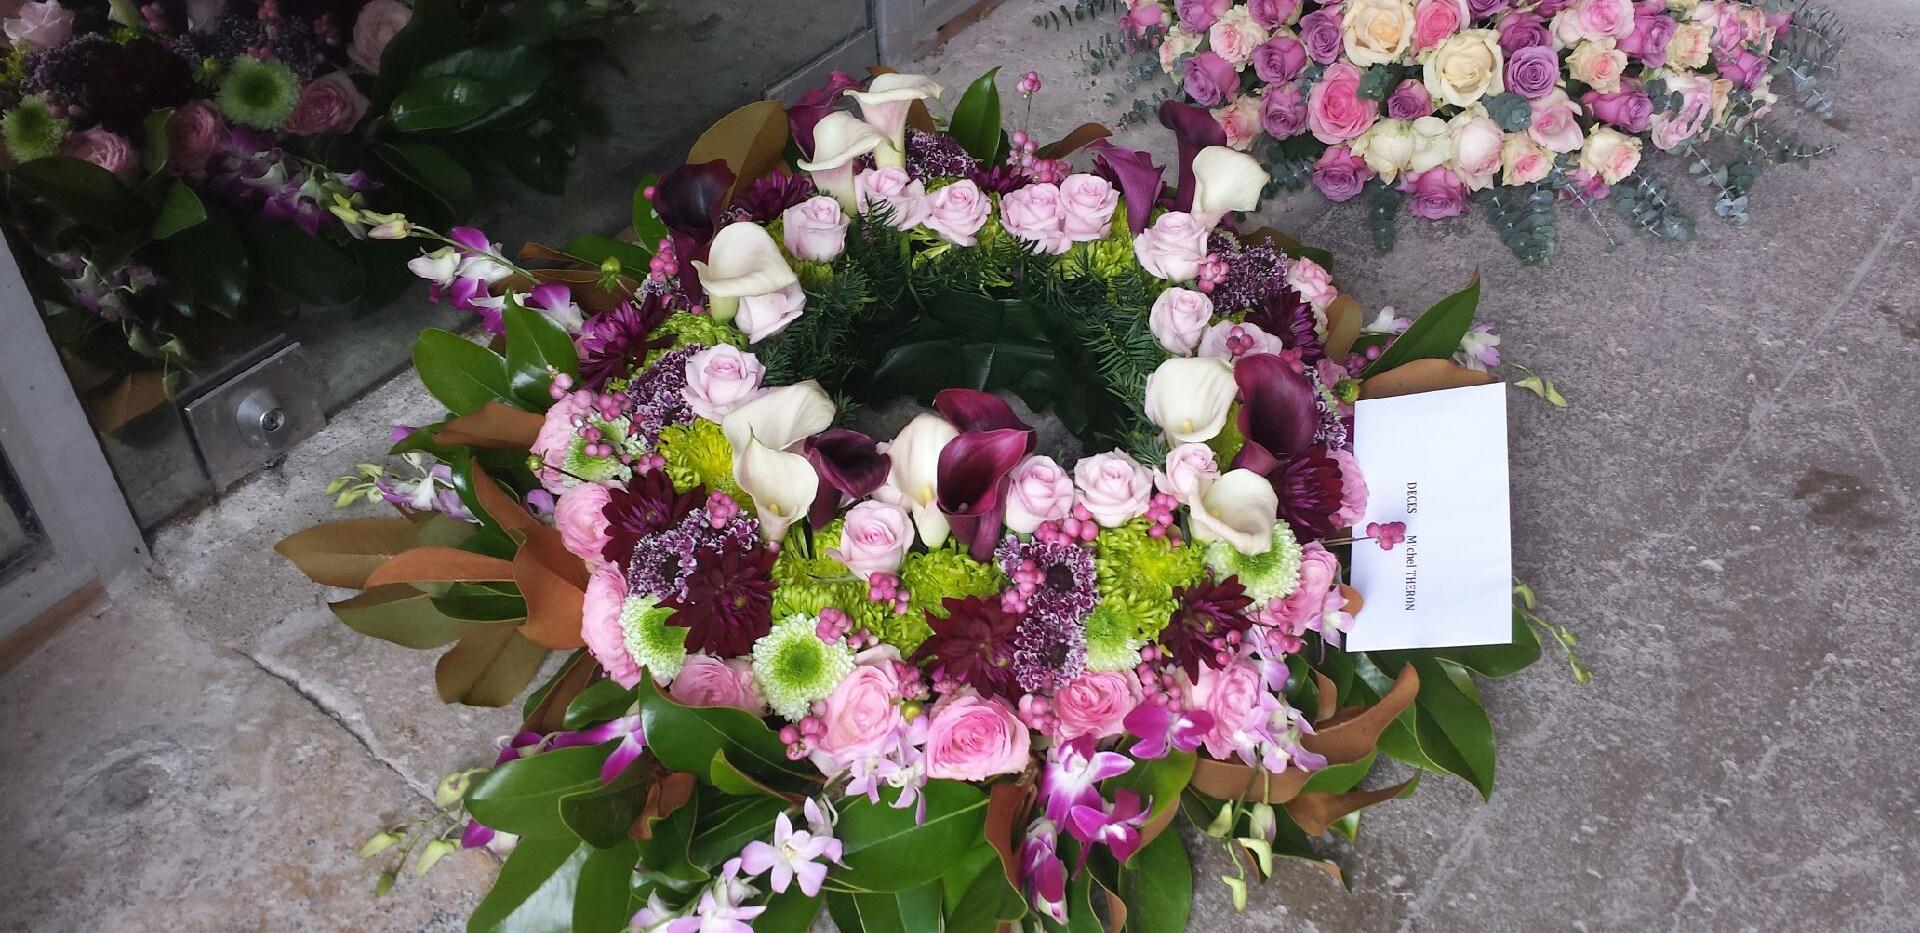 Rose Basque, Fleuriste à Ustaritz